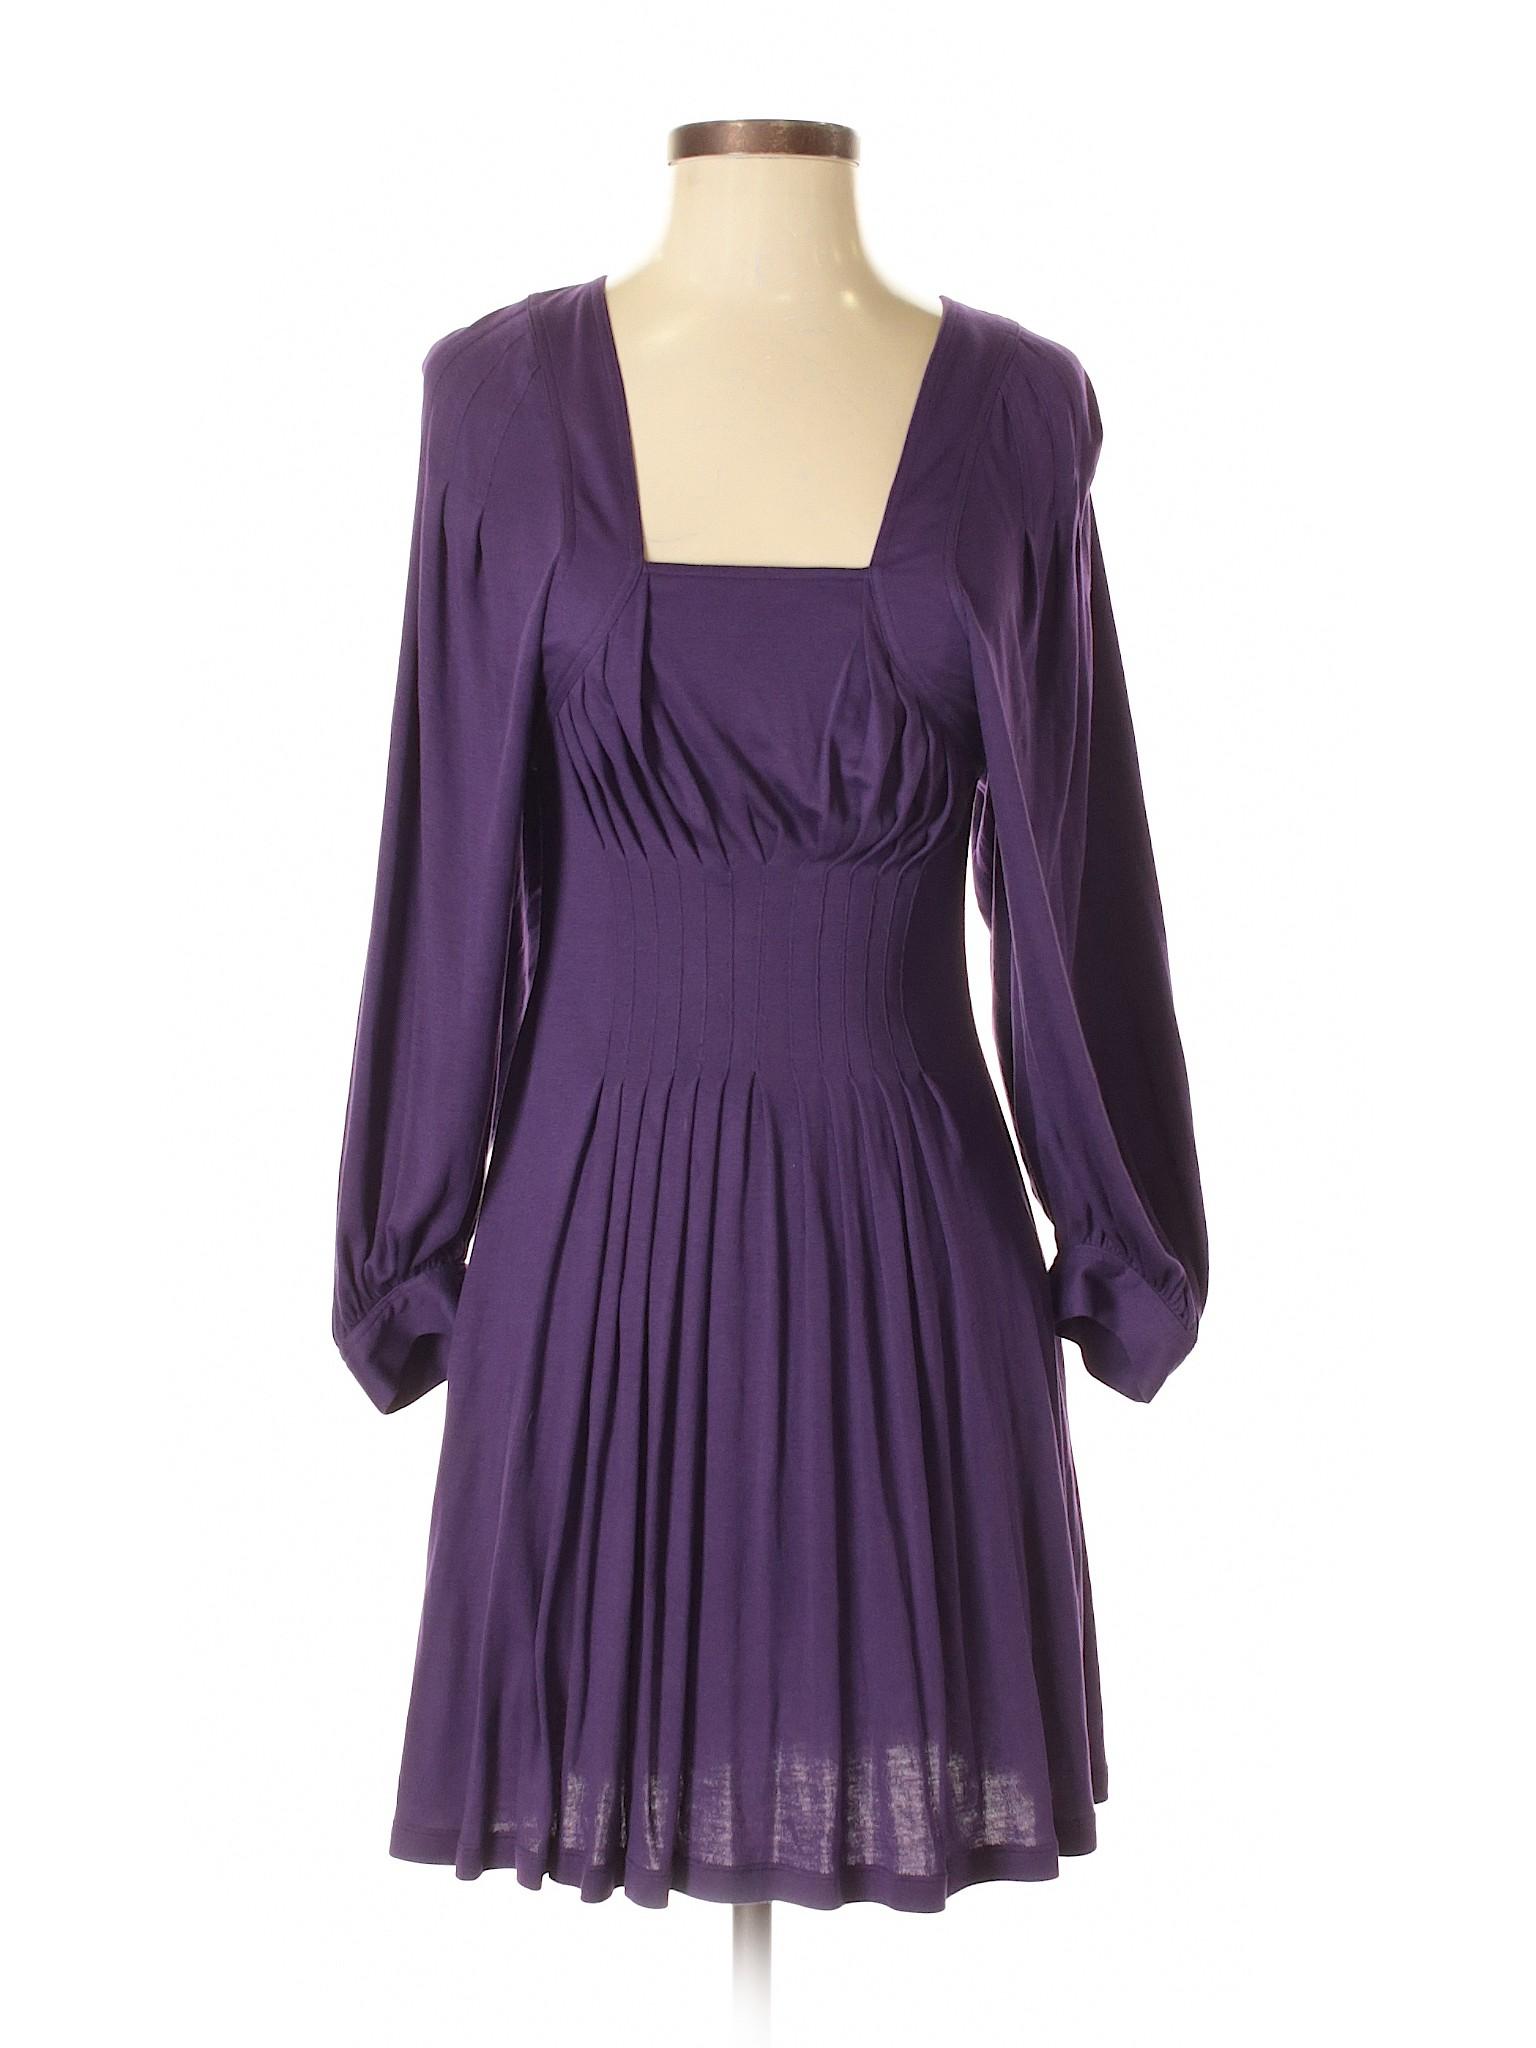 Casual Dress Dress BCBGMAXAZRIA Casual Selling BCBGMAXAZRIA Selling BCBGMAXAZRIA Casual Selling qvInxwxSZ